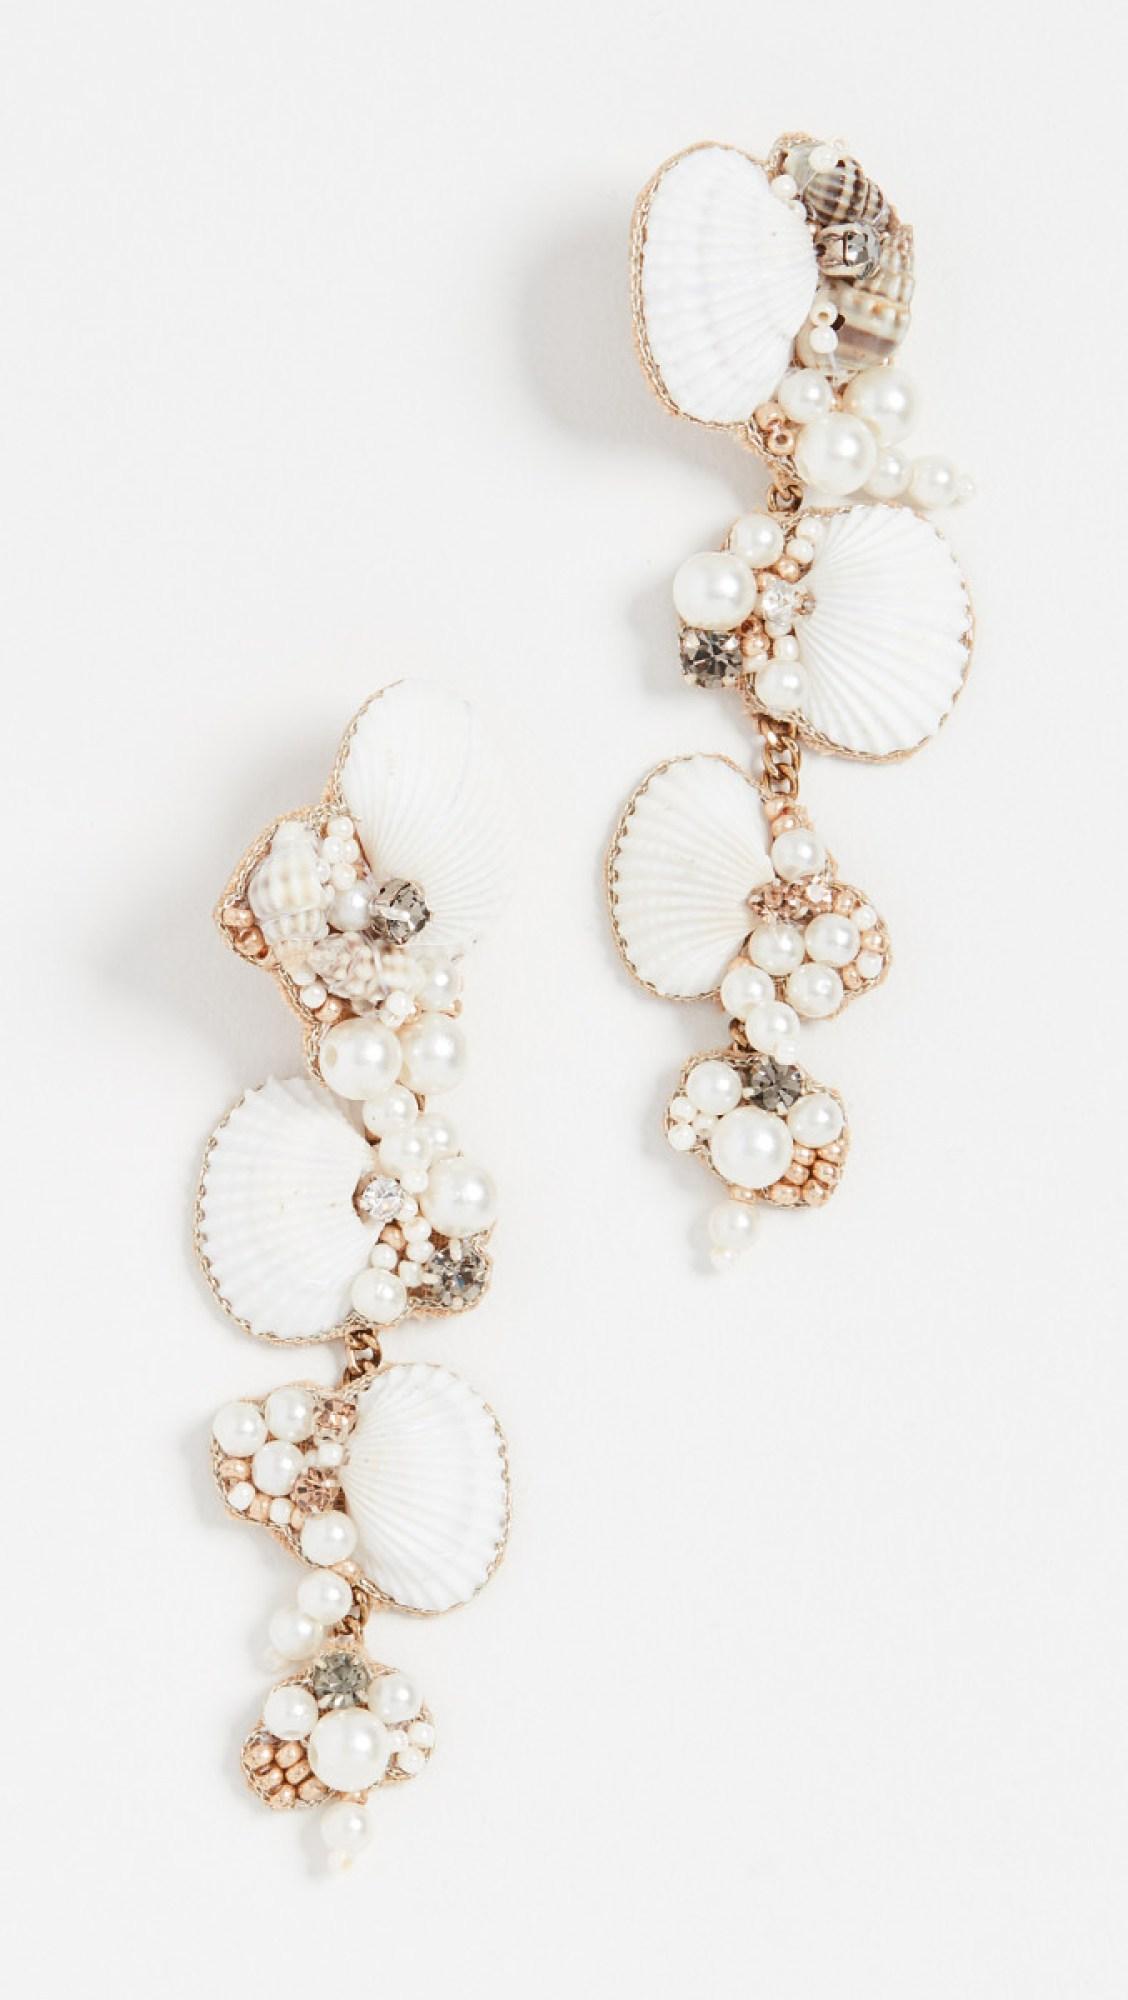 Deepa by Deepa Gurnani Aliyah Earrings, $80, available here.